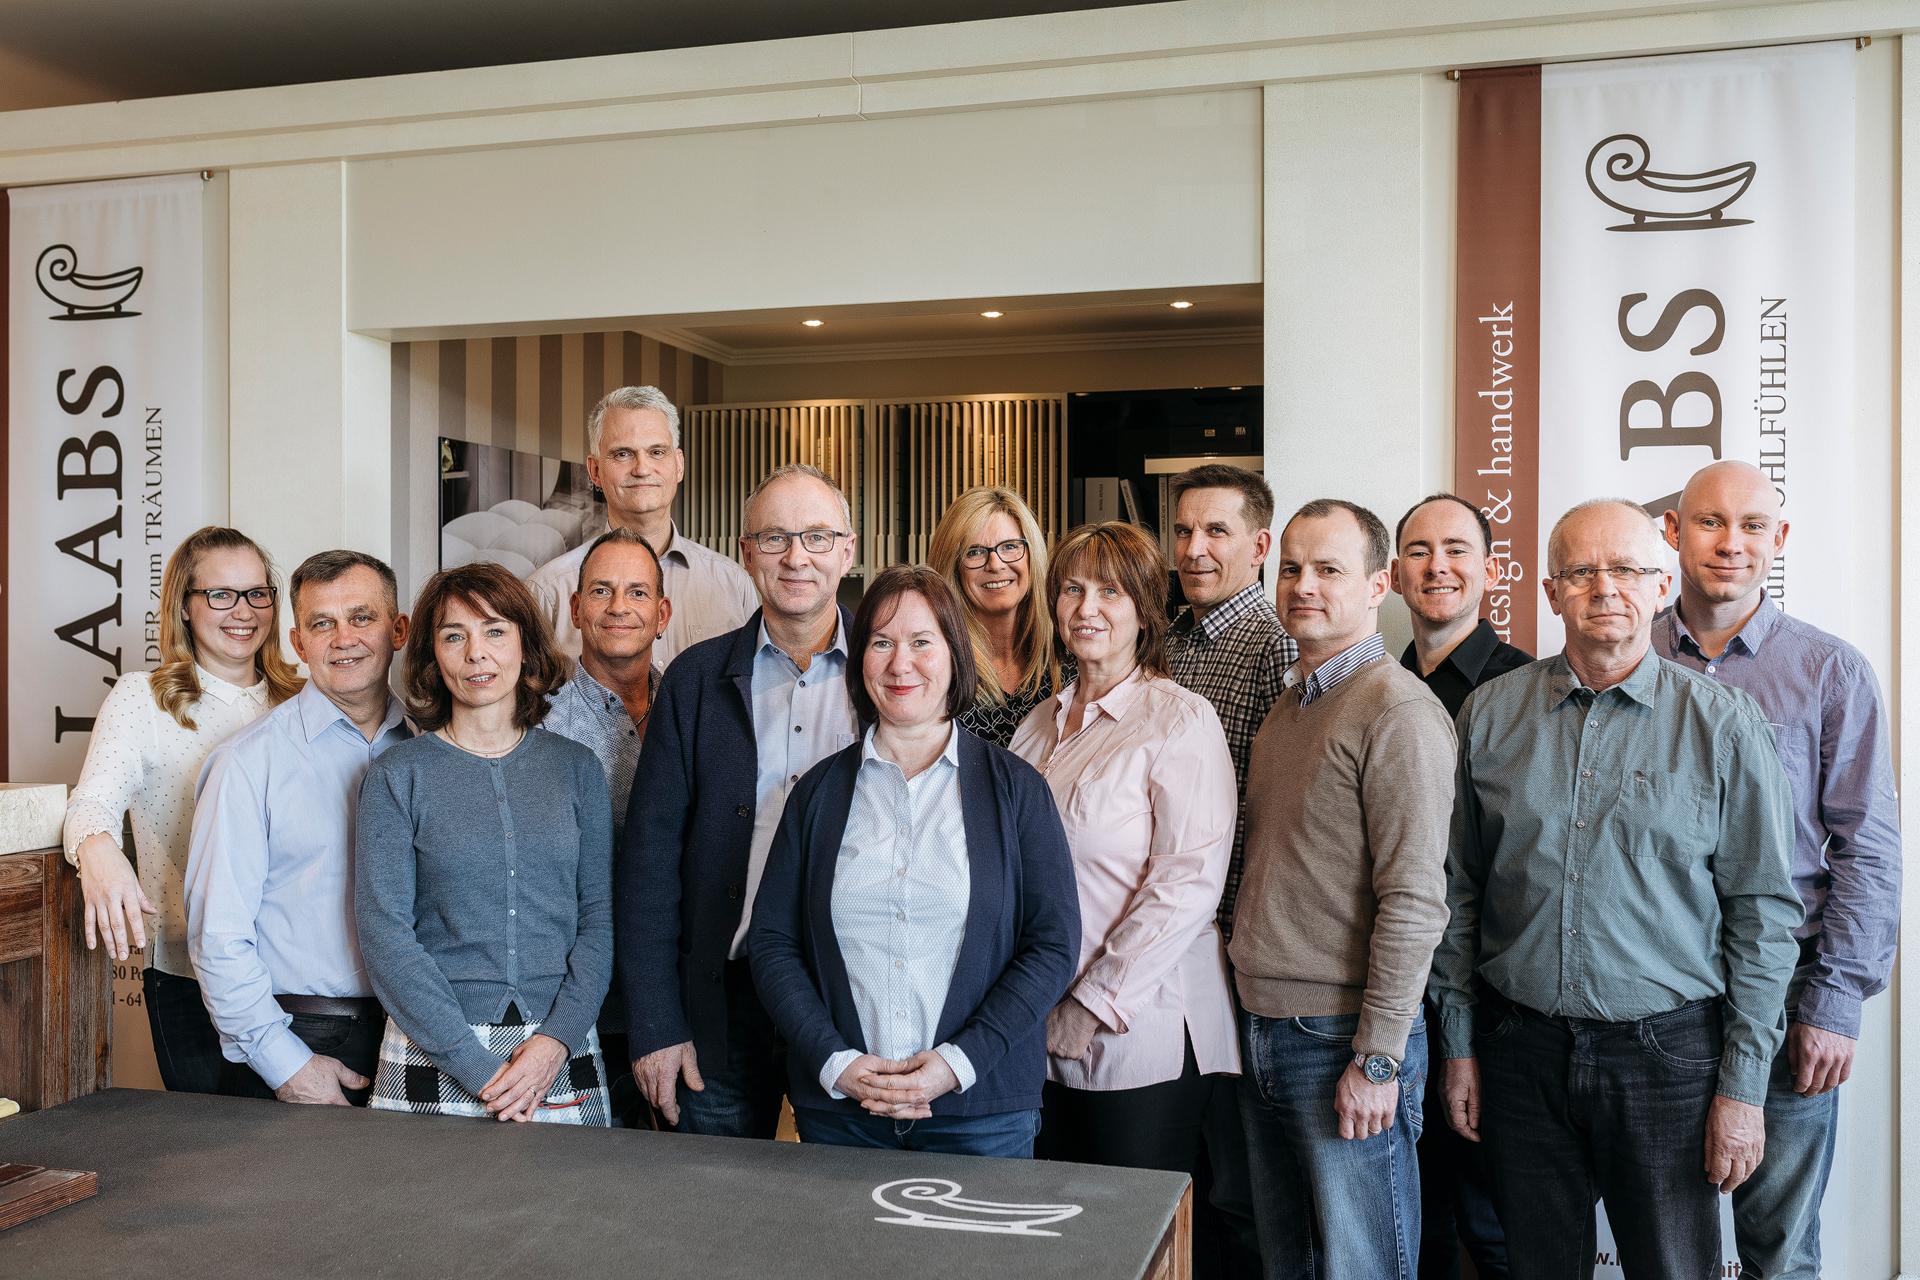 Basis kontakt team laabs potsdam drewitz berlin brandenburg badrenovierung - Laabs potsdam ...